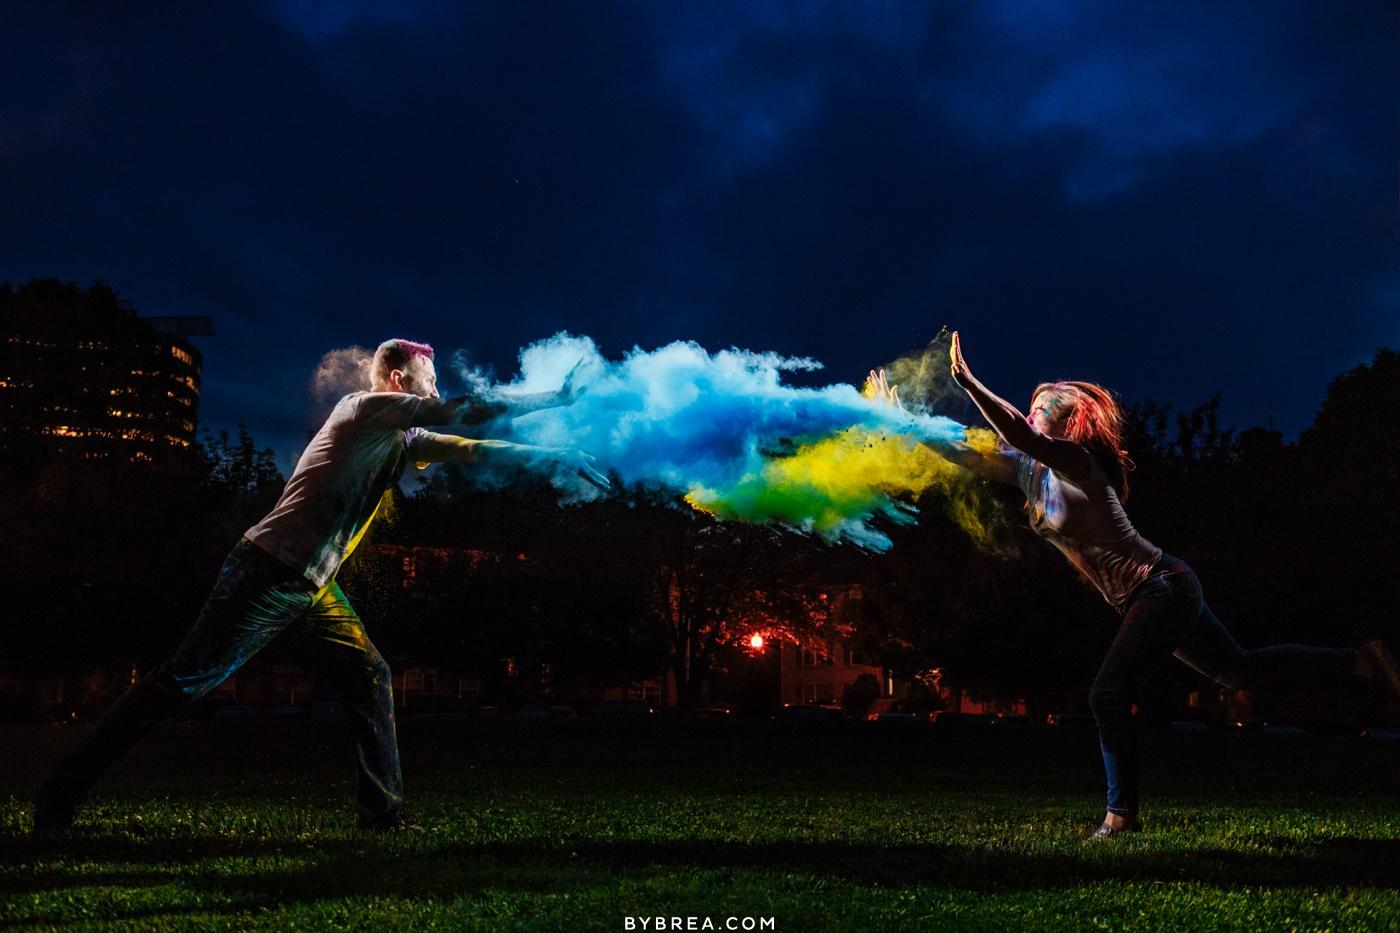 Baltimore engagement photo of couple having paint powder fight creative lighting night time shot